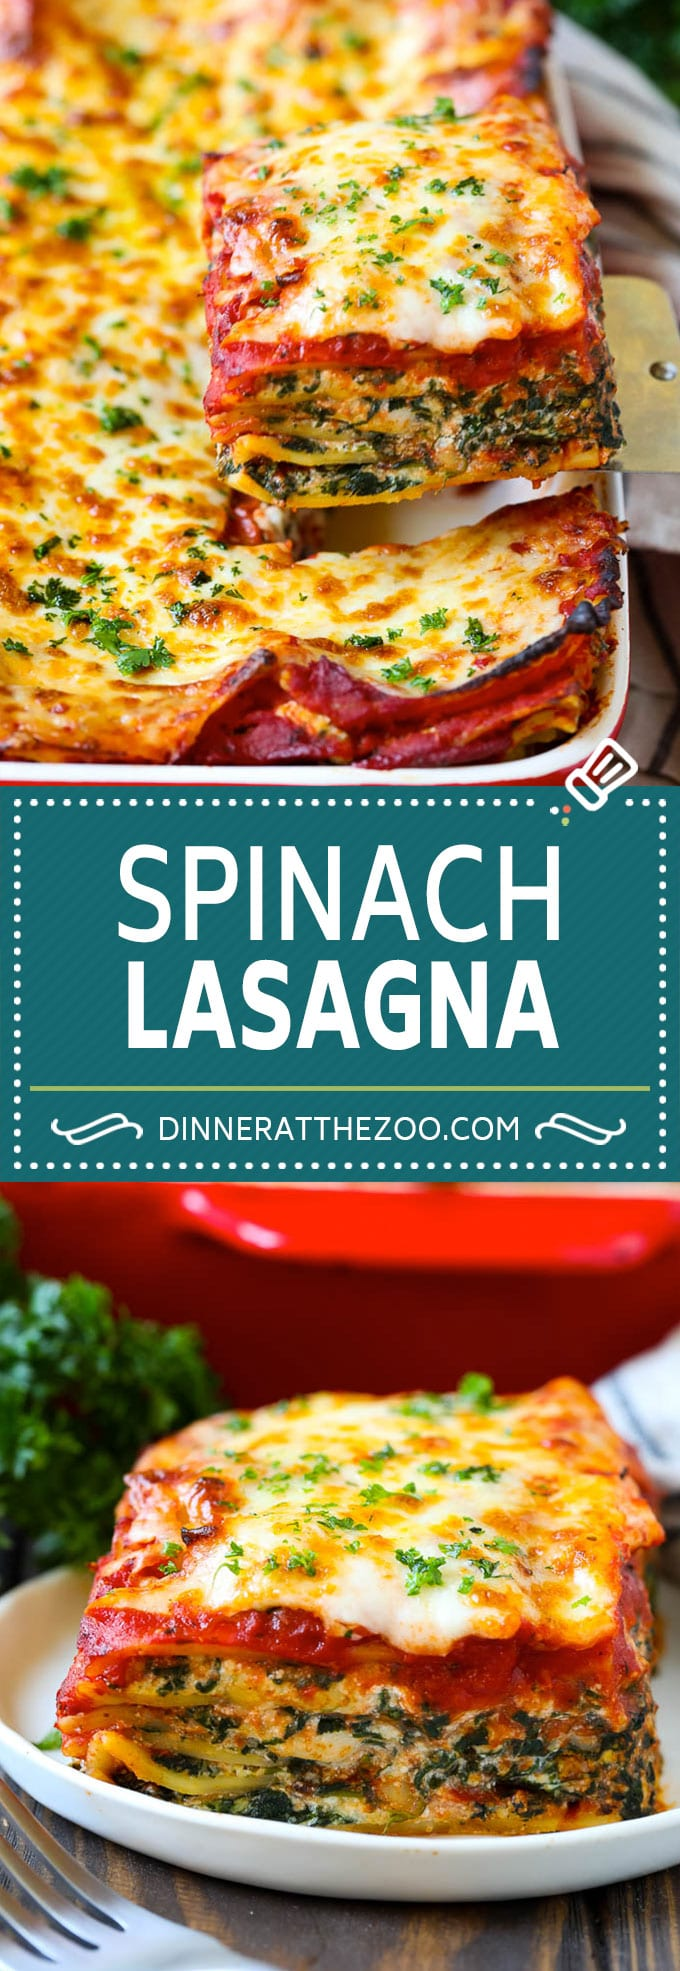 Spinach Lasagna Recipe | Vegetarian Lasagna #lasagna #spinach #cheese #pasta #italianfood #dinner #dinneratthezoo